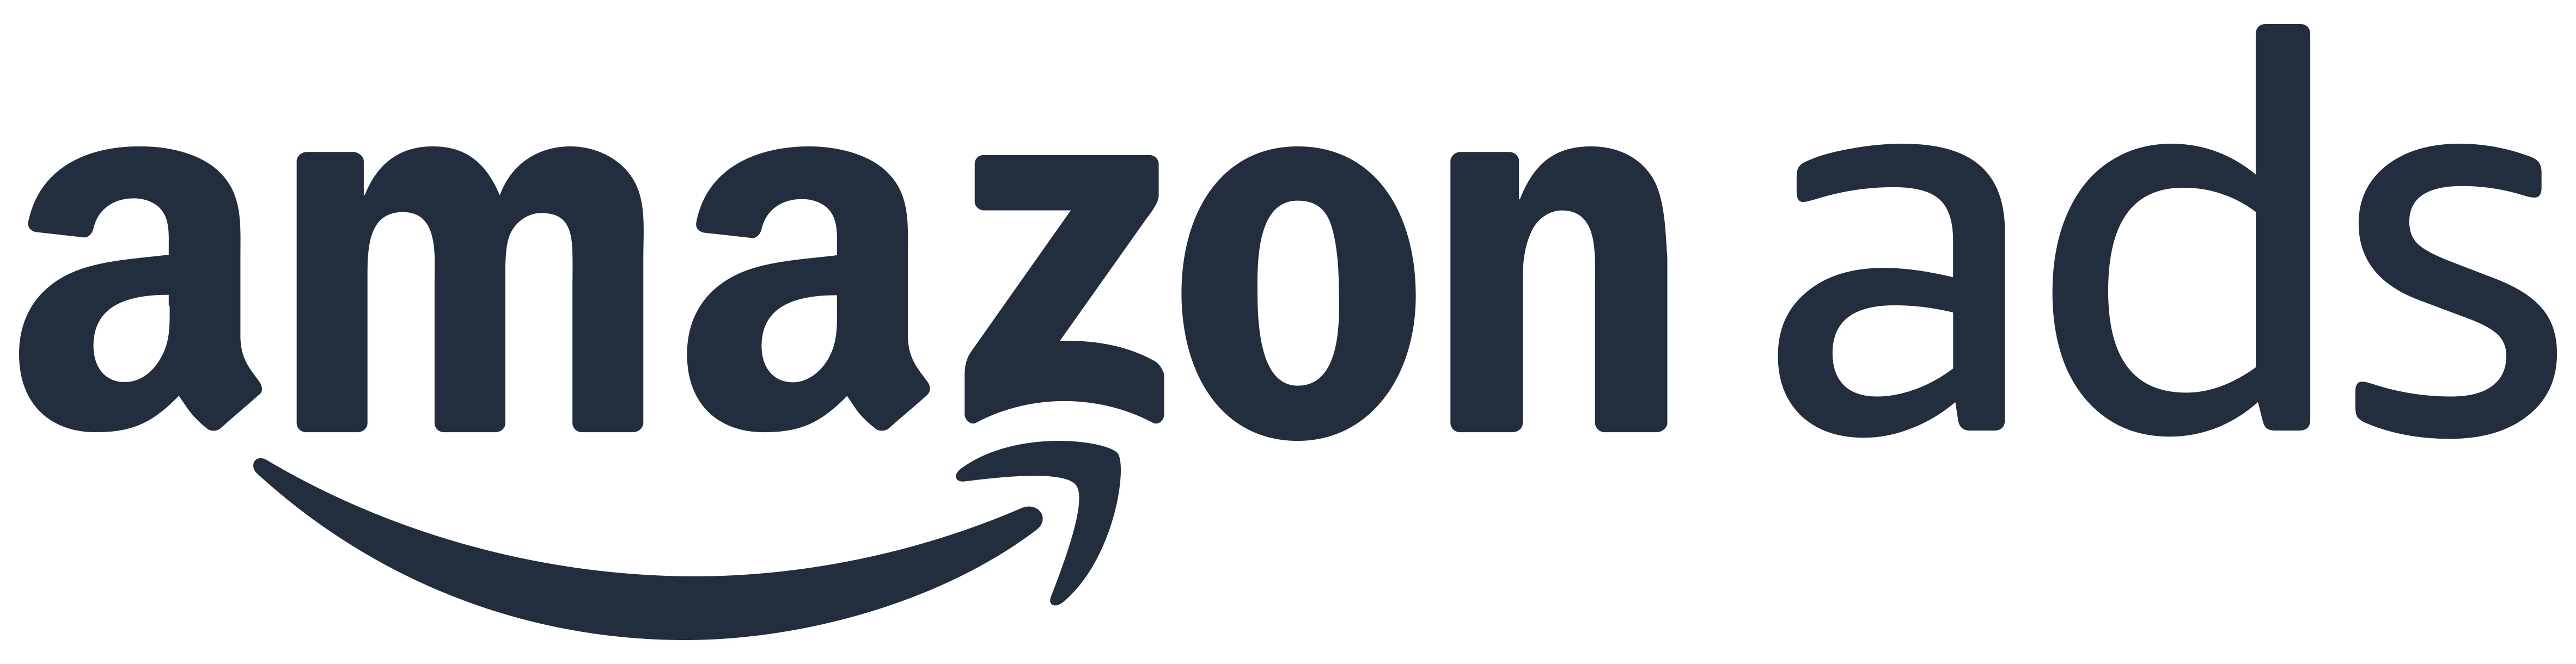 alt='Amazon Advertising'  Title='Amazon Advertising'